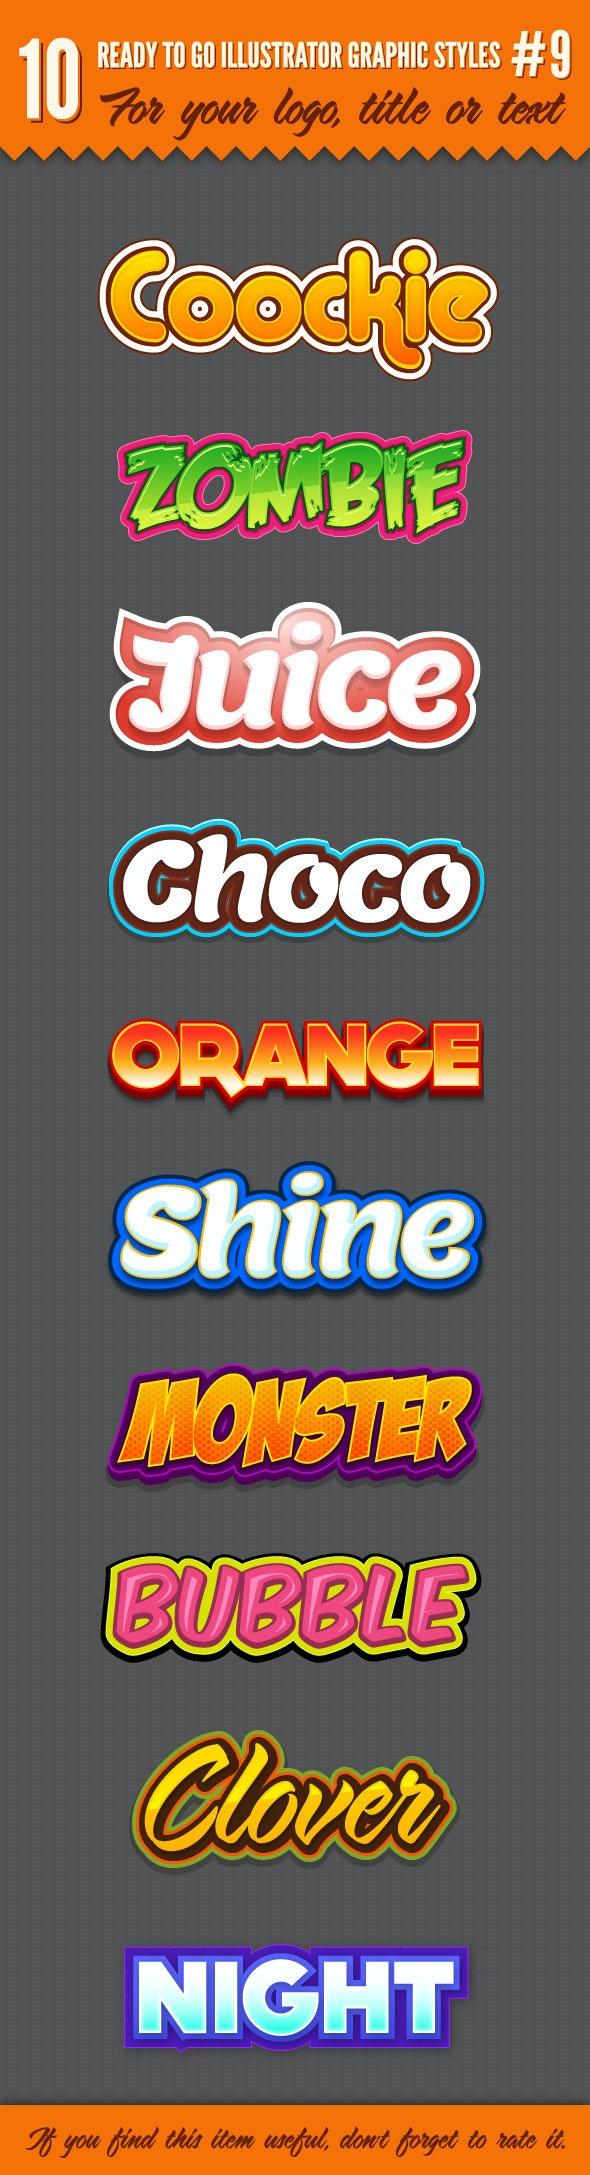 10 Logo Graphic Styles #9 - Styles Illustrator